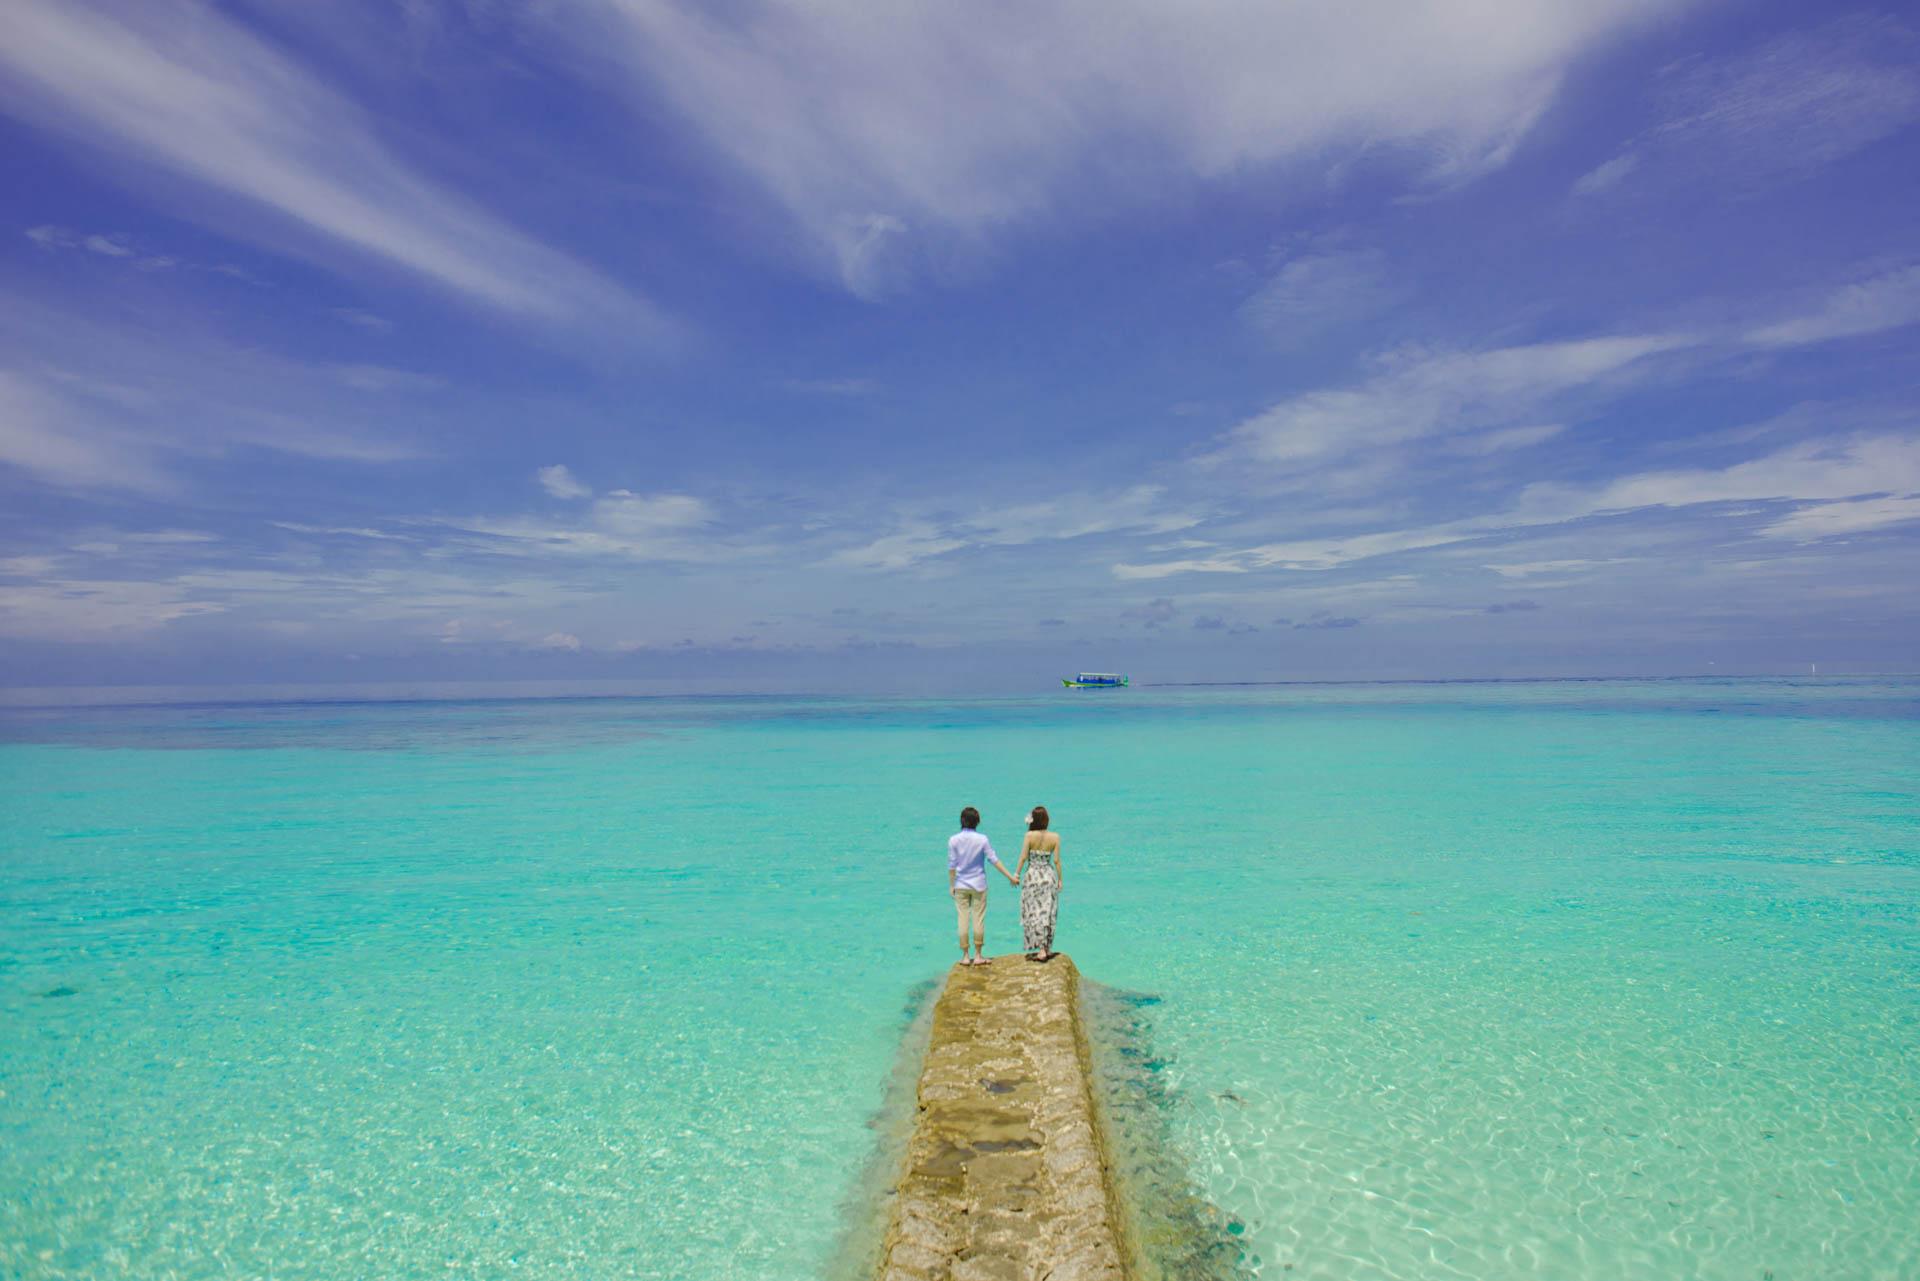 Devin and Natsuko Honeymoon at Makunudhoo Island Maldives 29